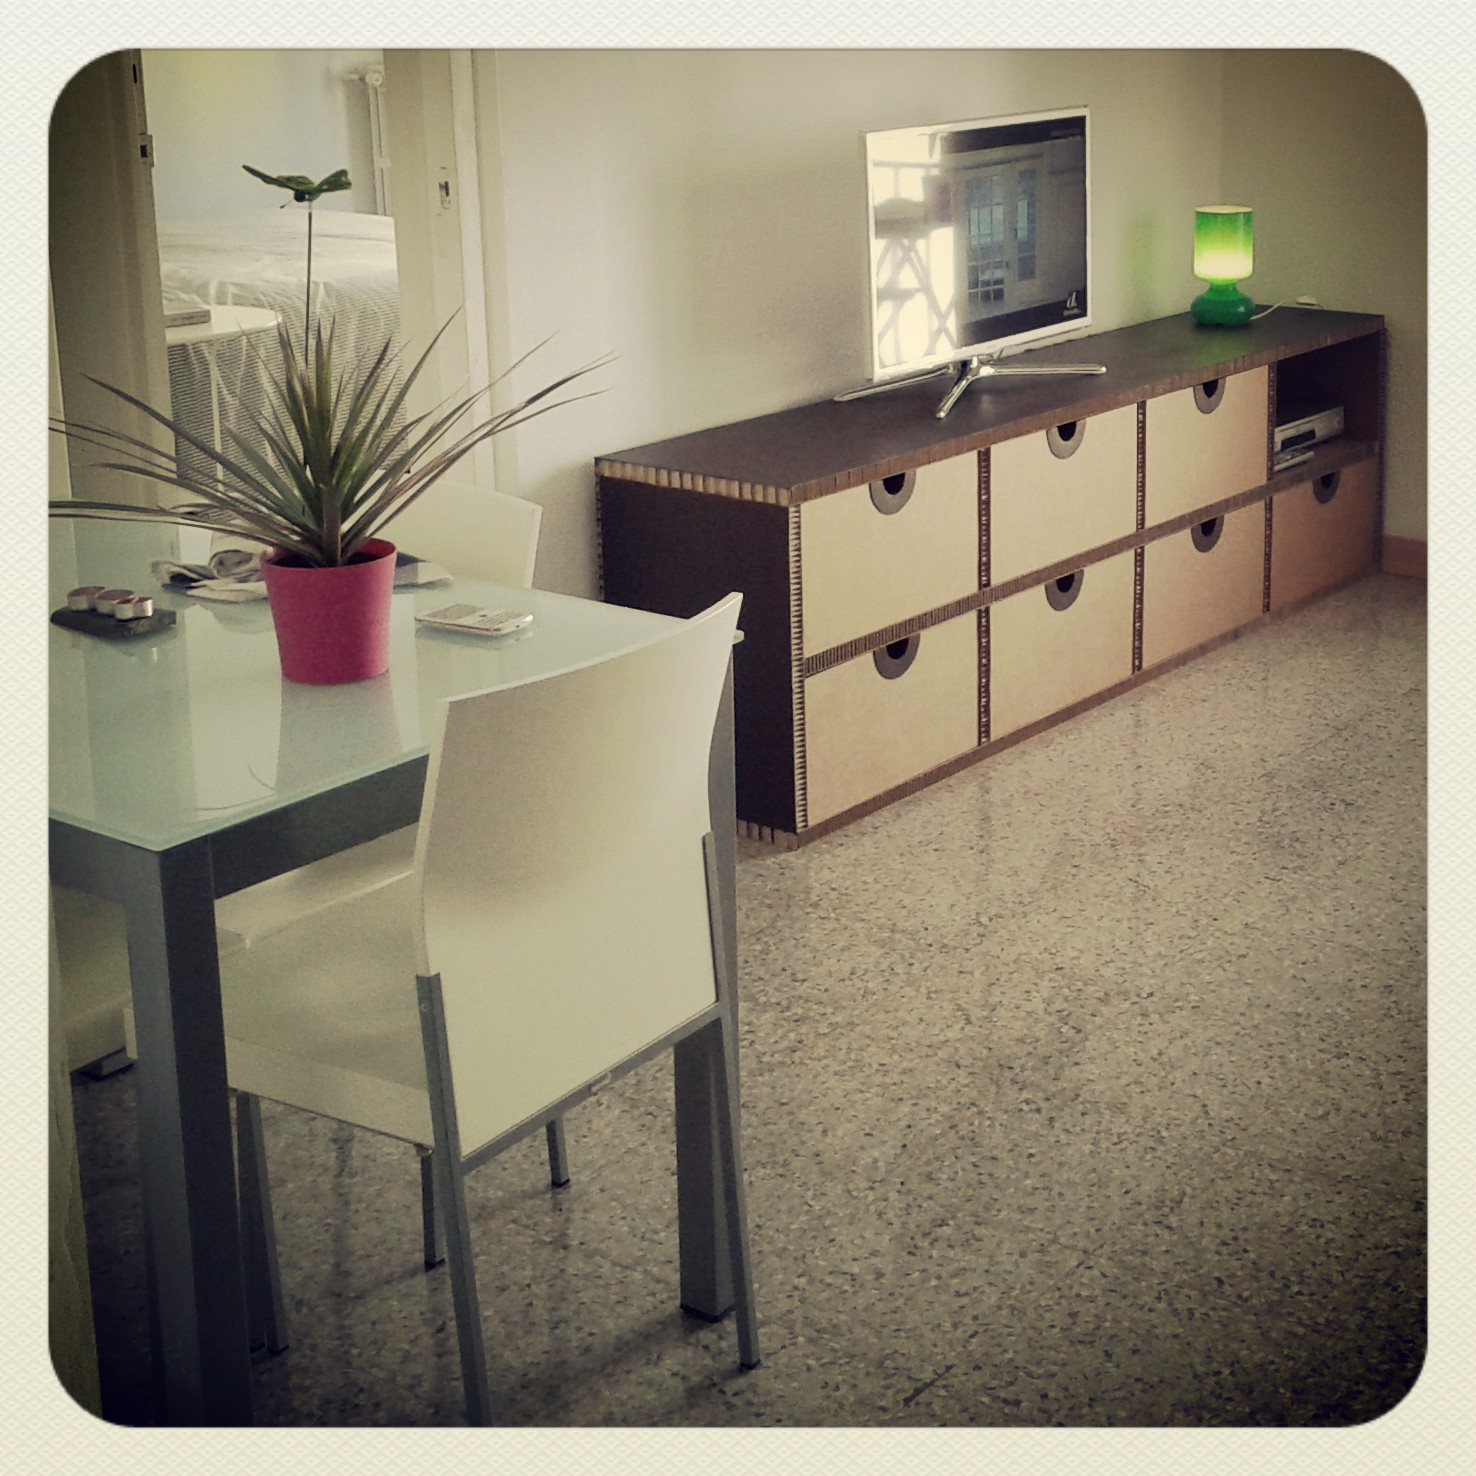 Muebles de cart n la cartoneria p gina 4 - Muebles para teles ...